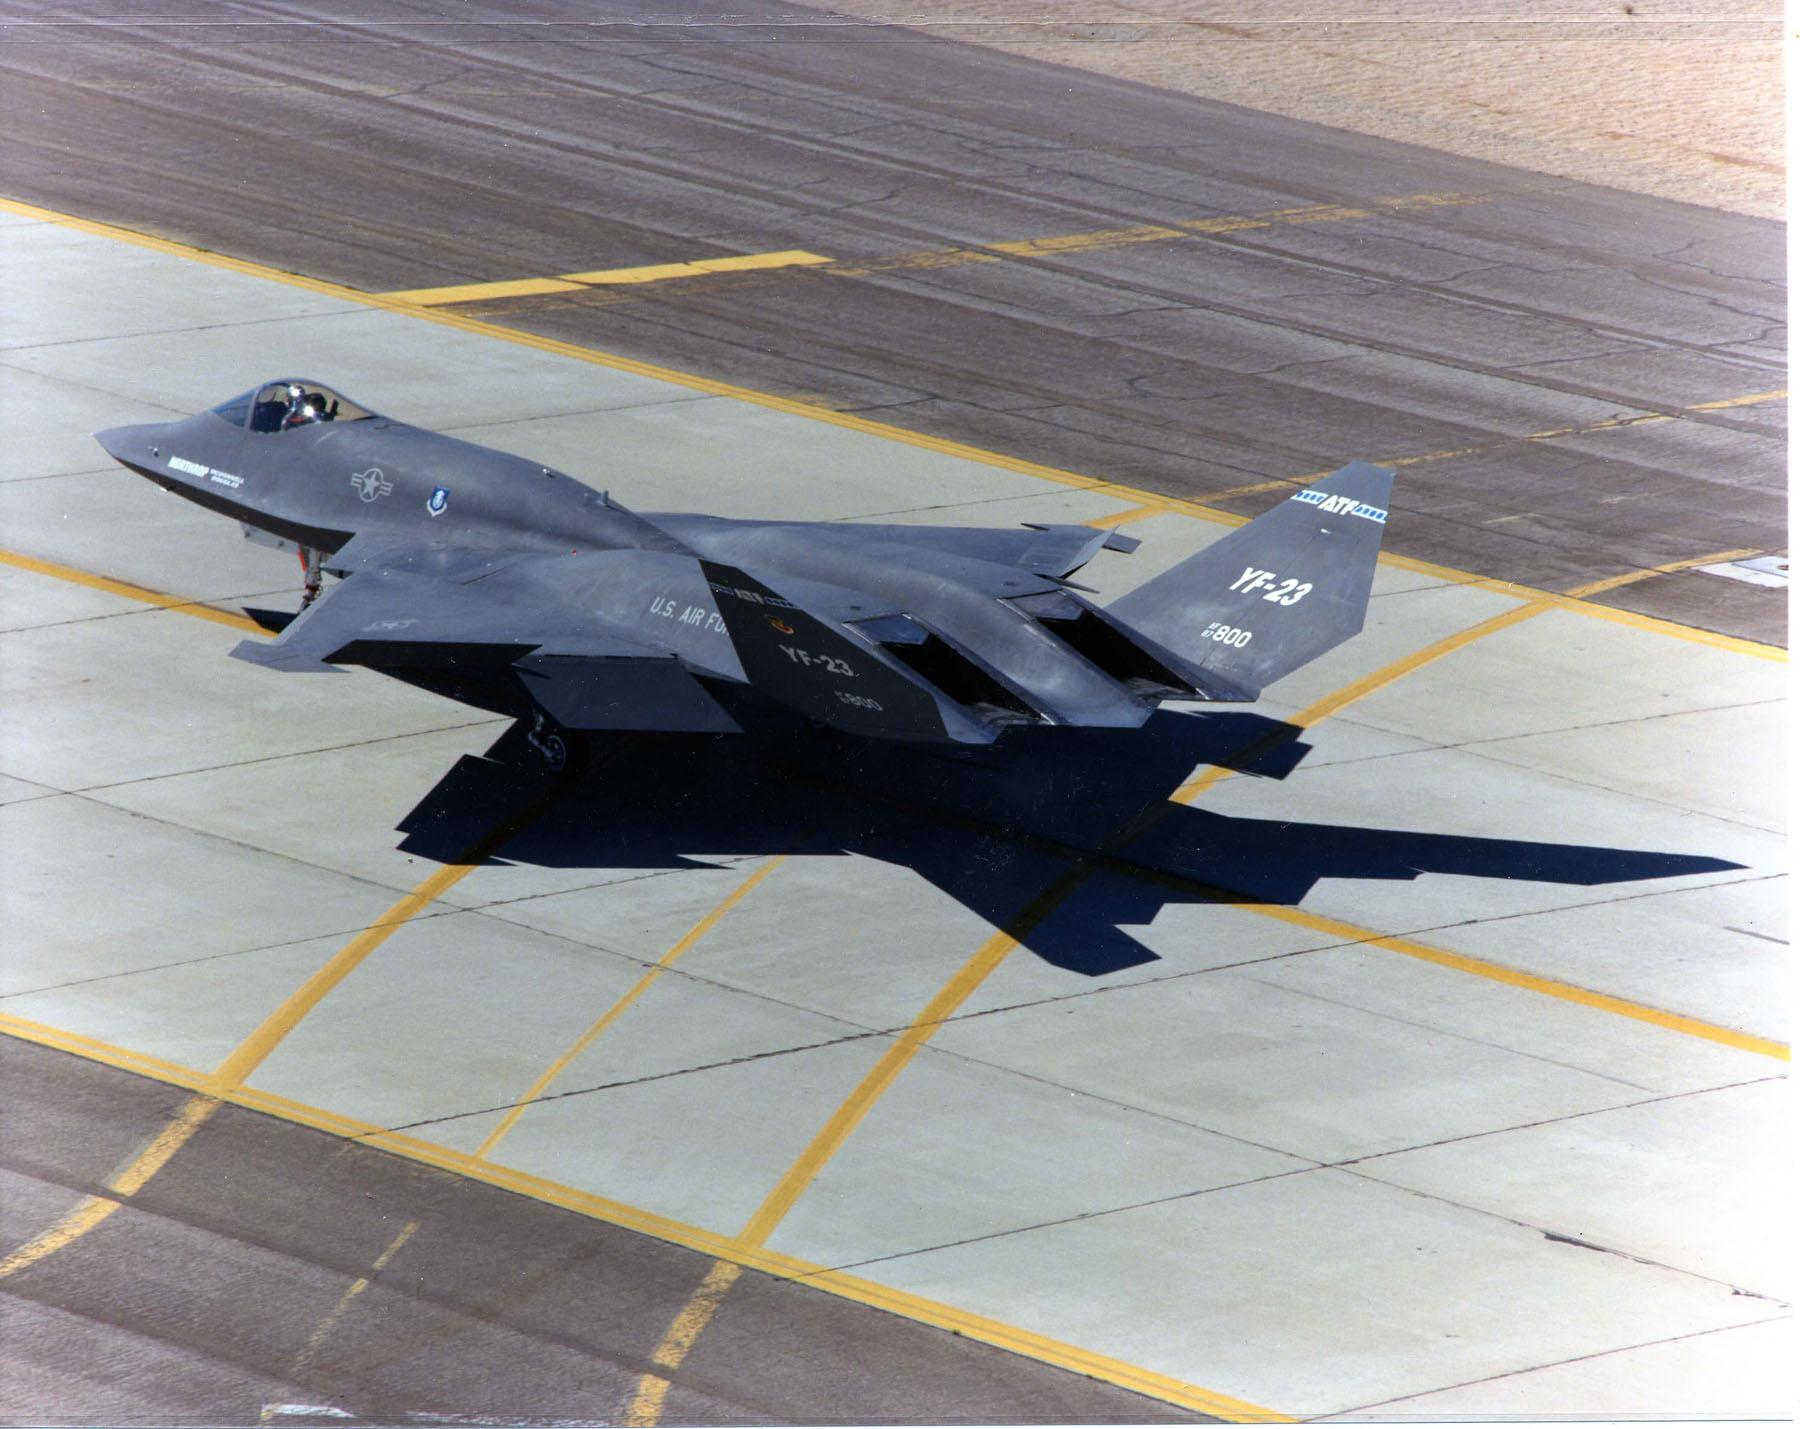 YF 23 (航空機)の画像 p1_22